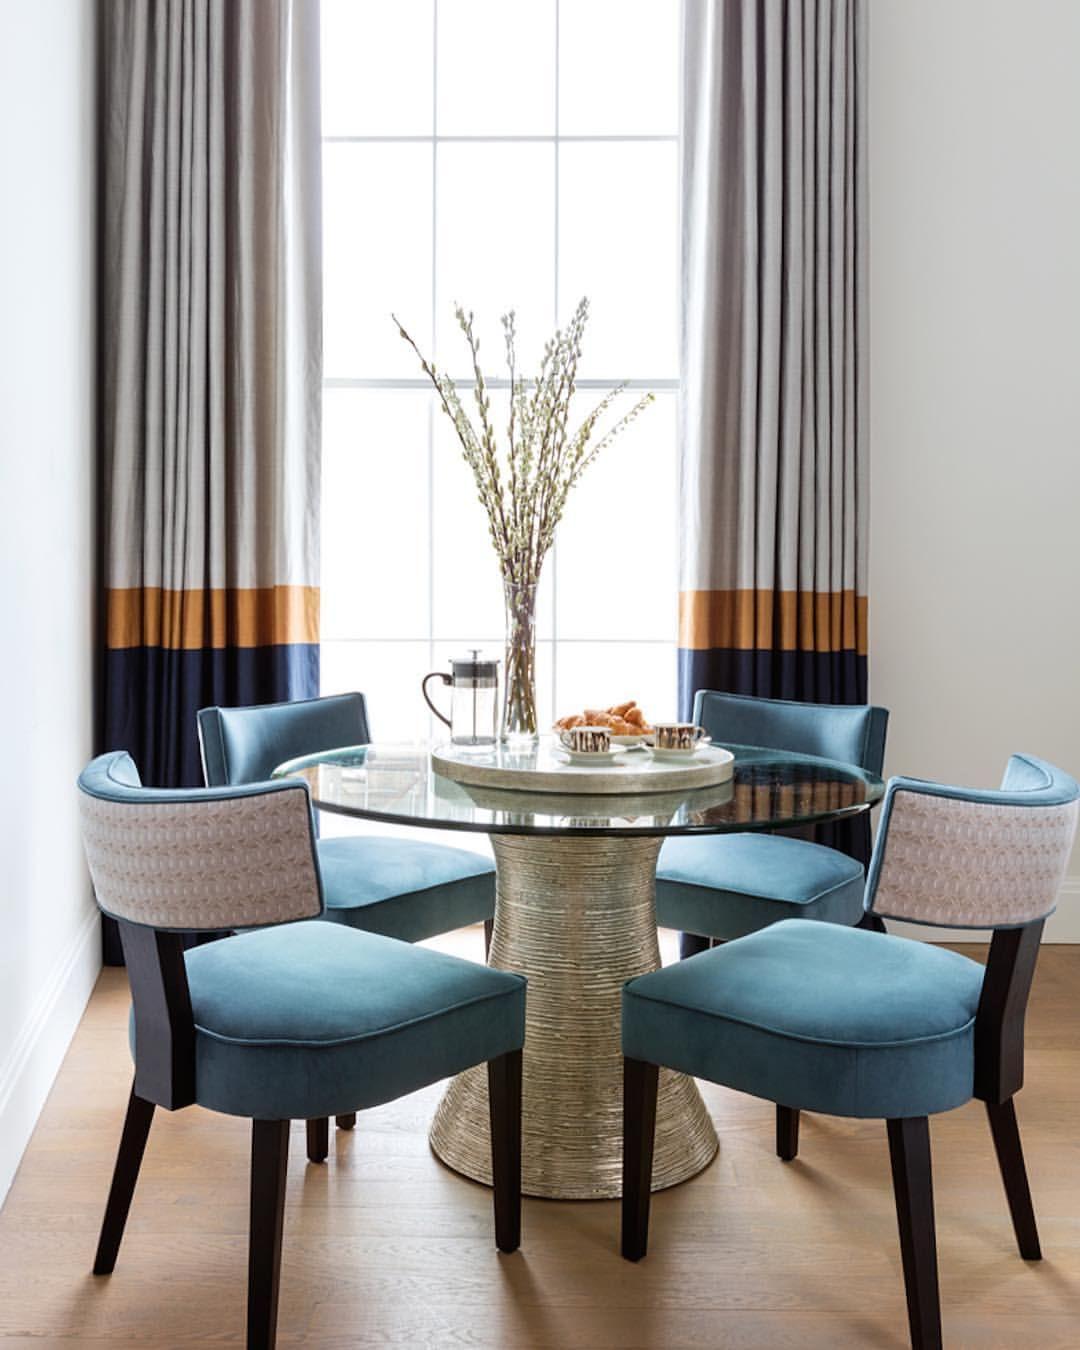 Dining Room Drapes: Curtains, Dining Room Design, Design